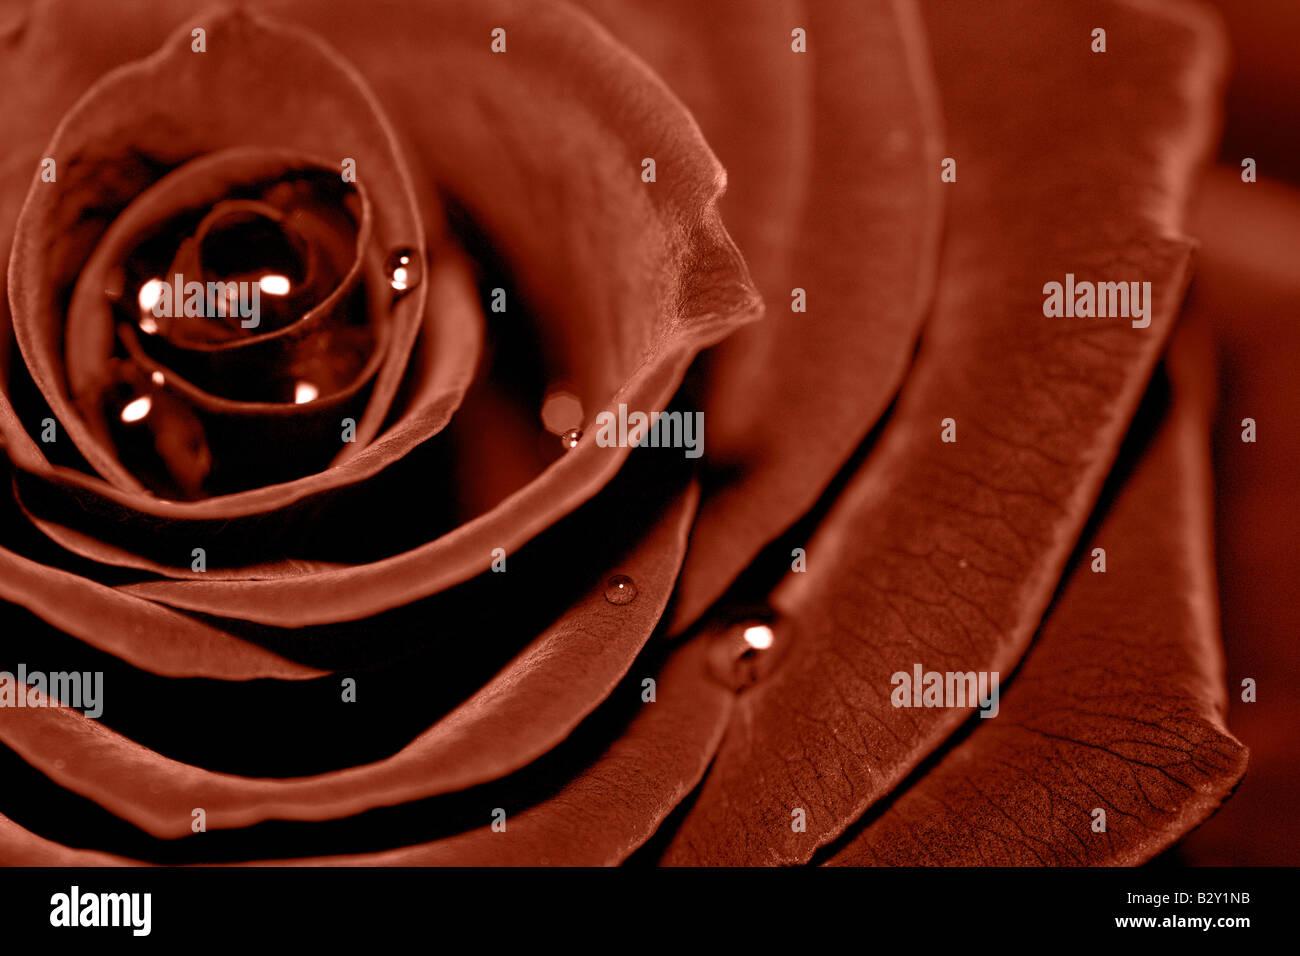 brown rose - Stock Image